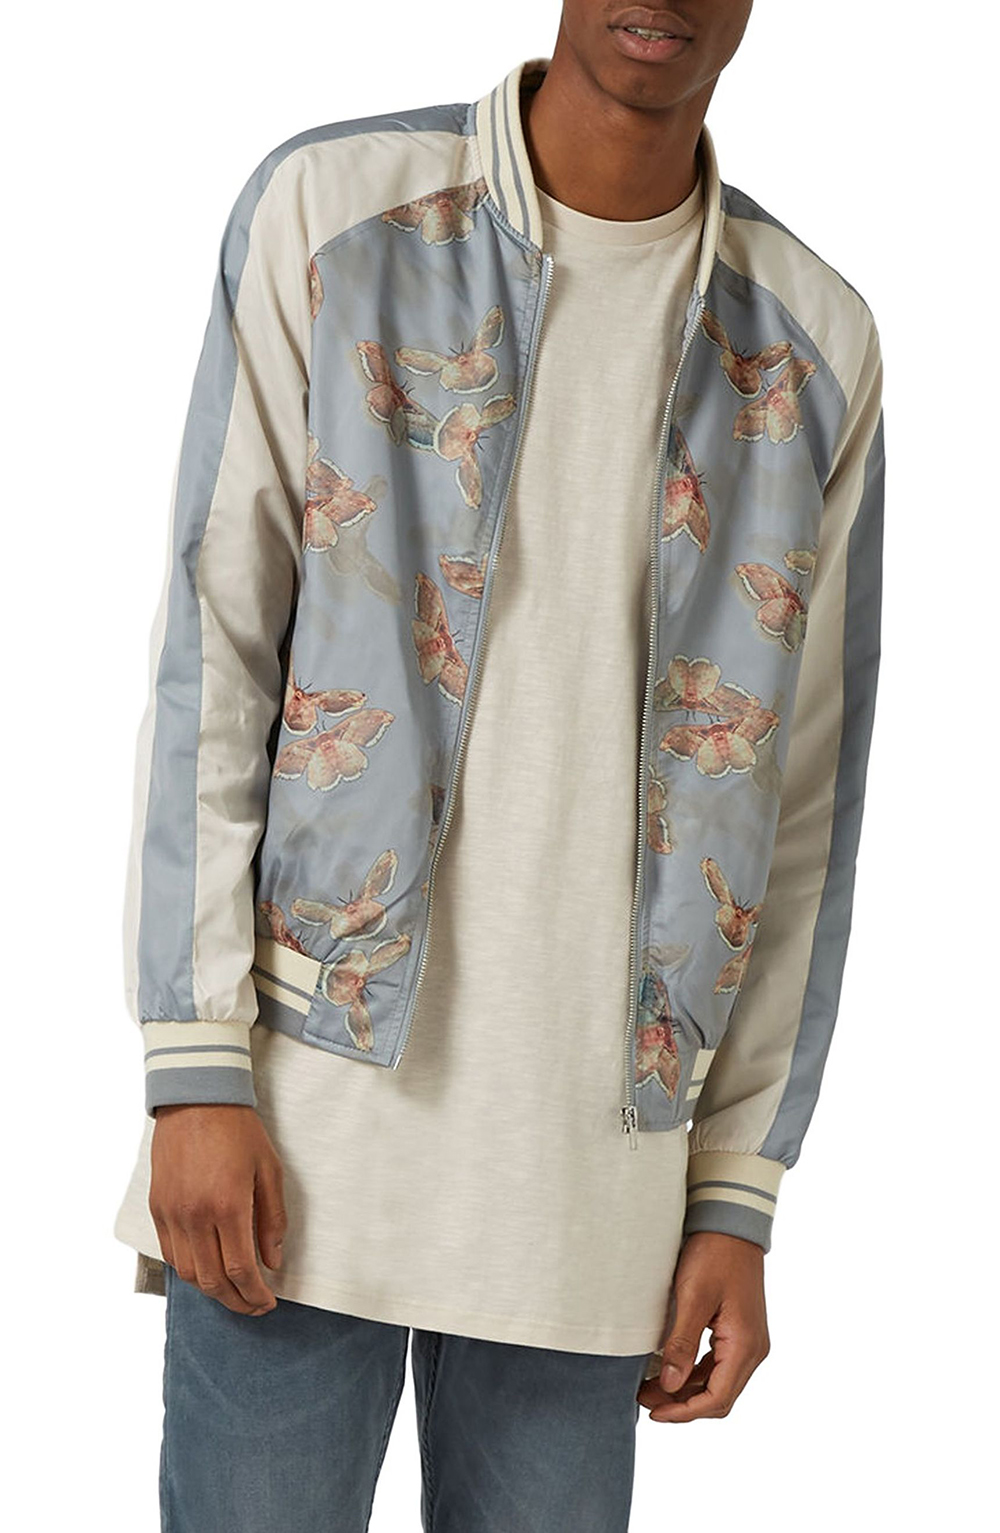 Topman Moth Print Souvenir Bomber Jacket - Spring Menswear: Button Downs and Bomber Jackets